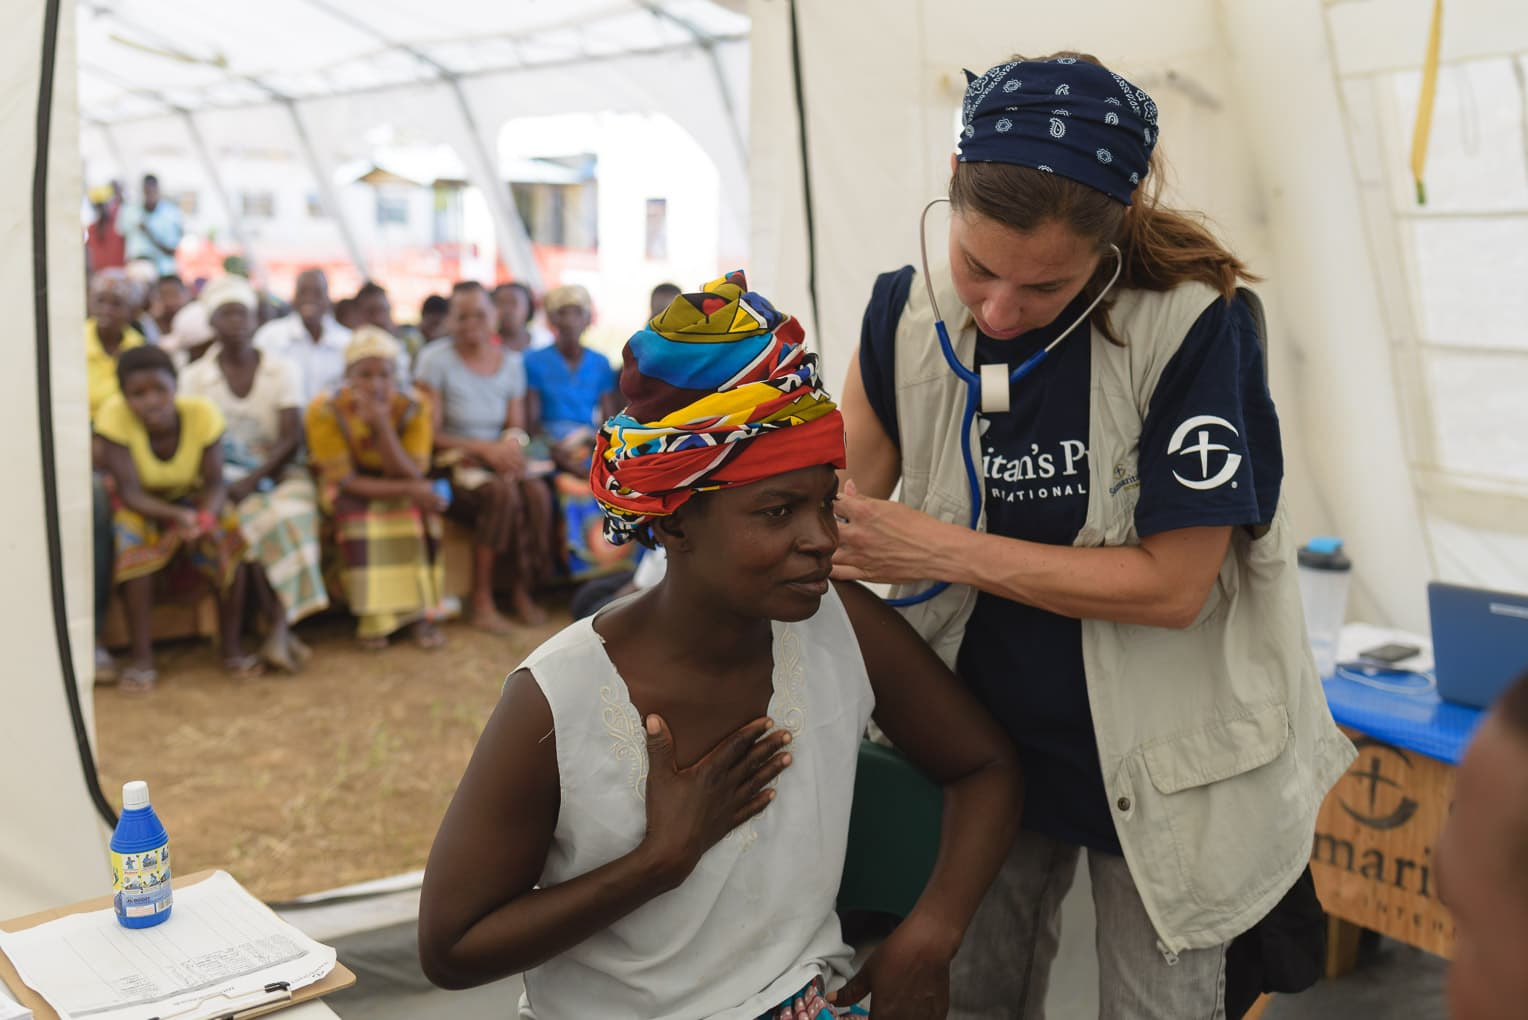 Cyclone Idai victim treated in Samaritan's Purse Emergency Field Hospital.